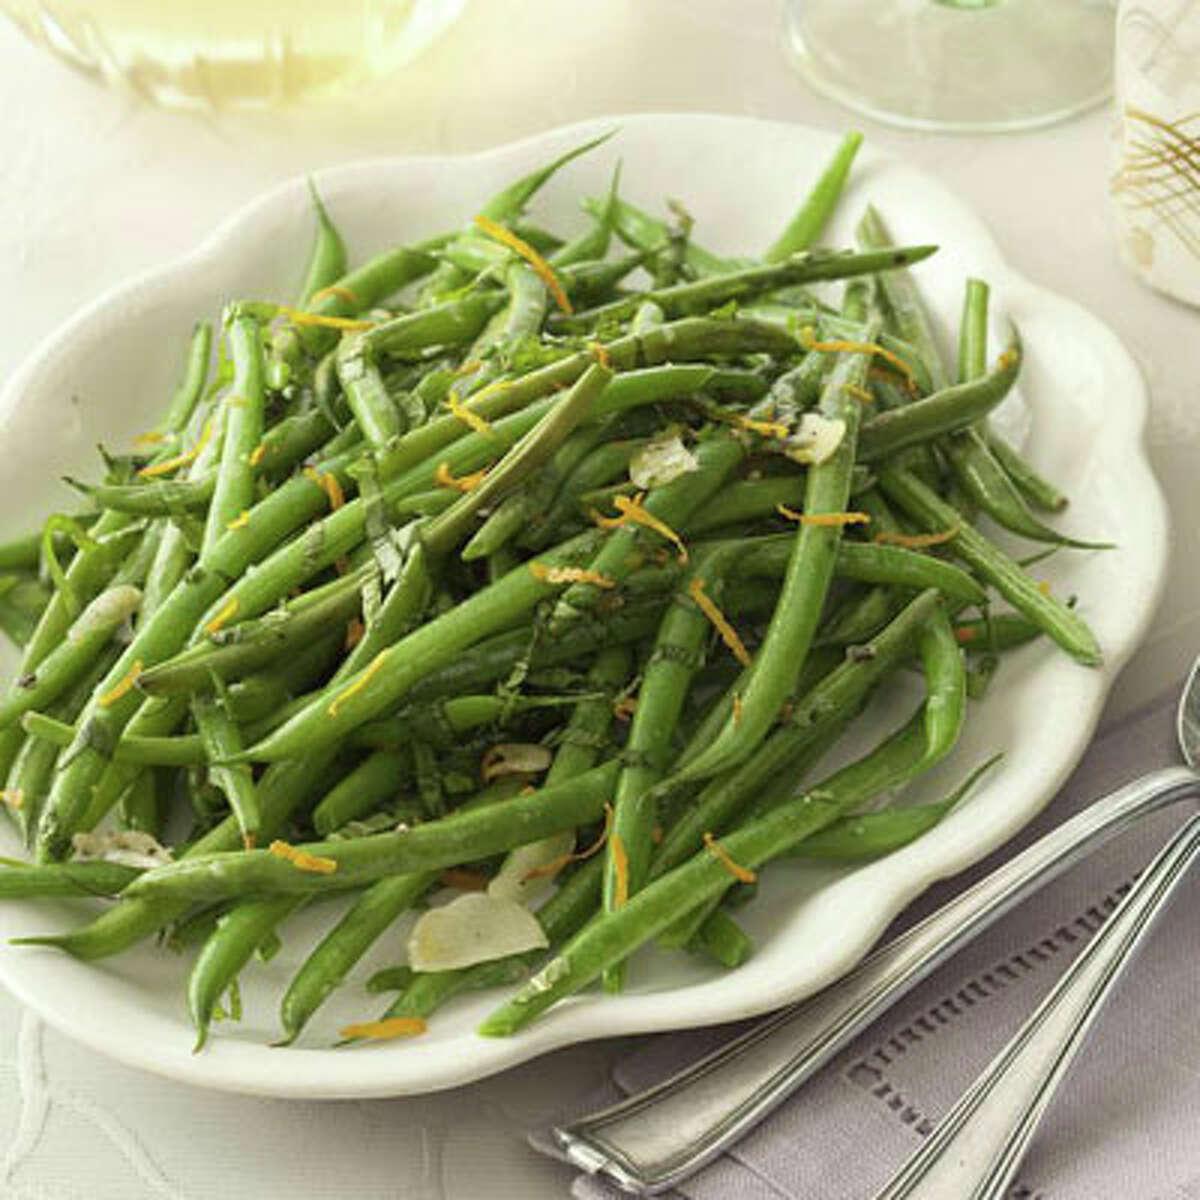 Stir-and-Serve Green Beans